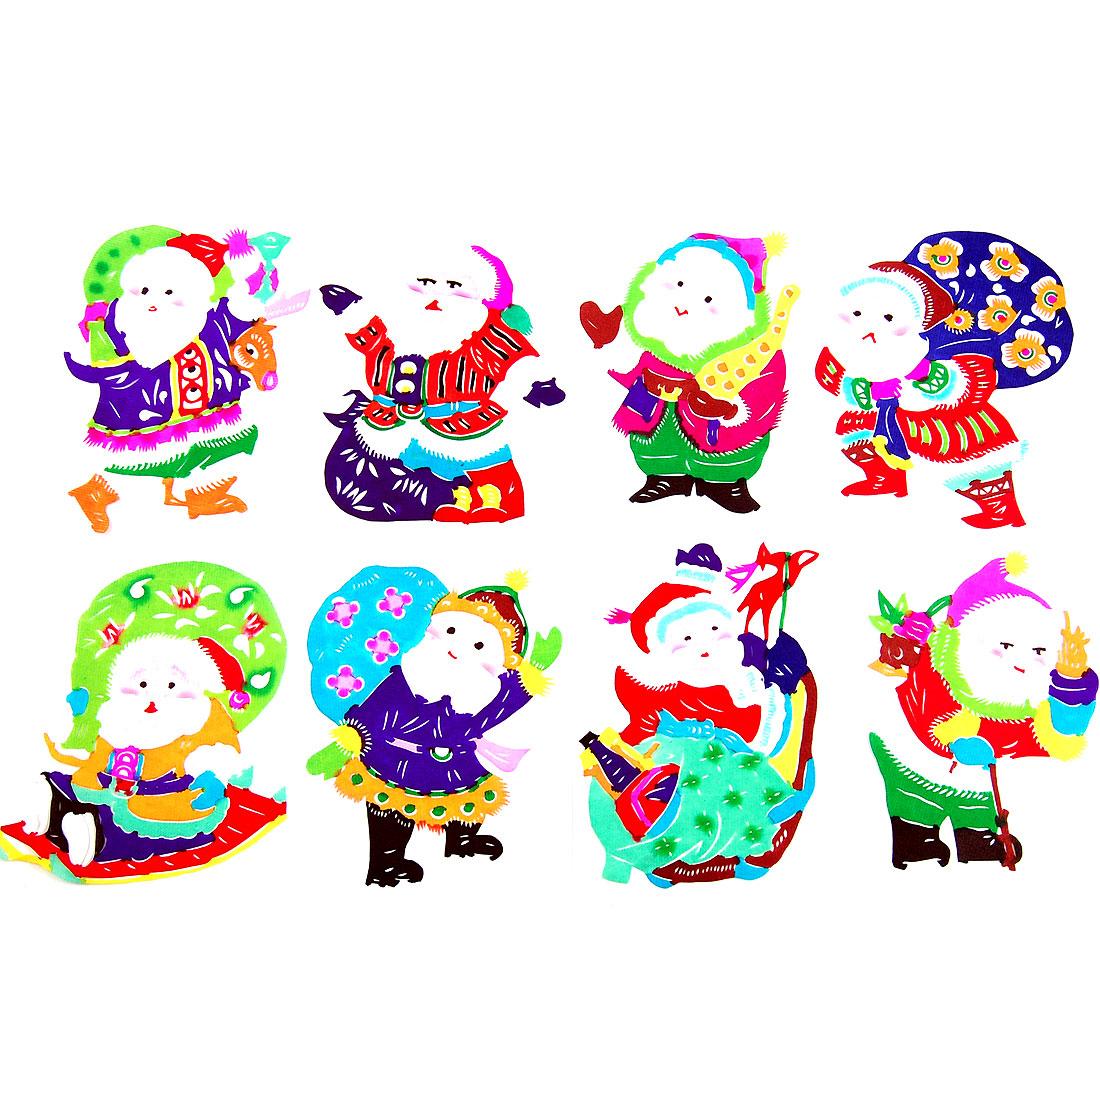 Colorful Santa Claus Handicraft Christmas Gift Chinese Papercut Book